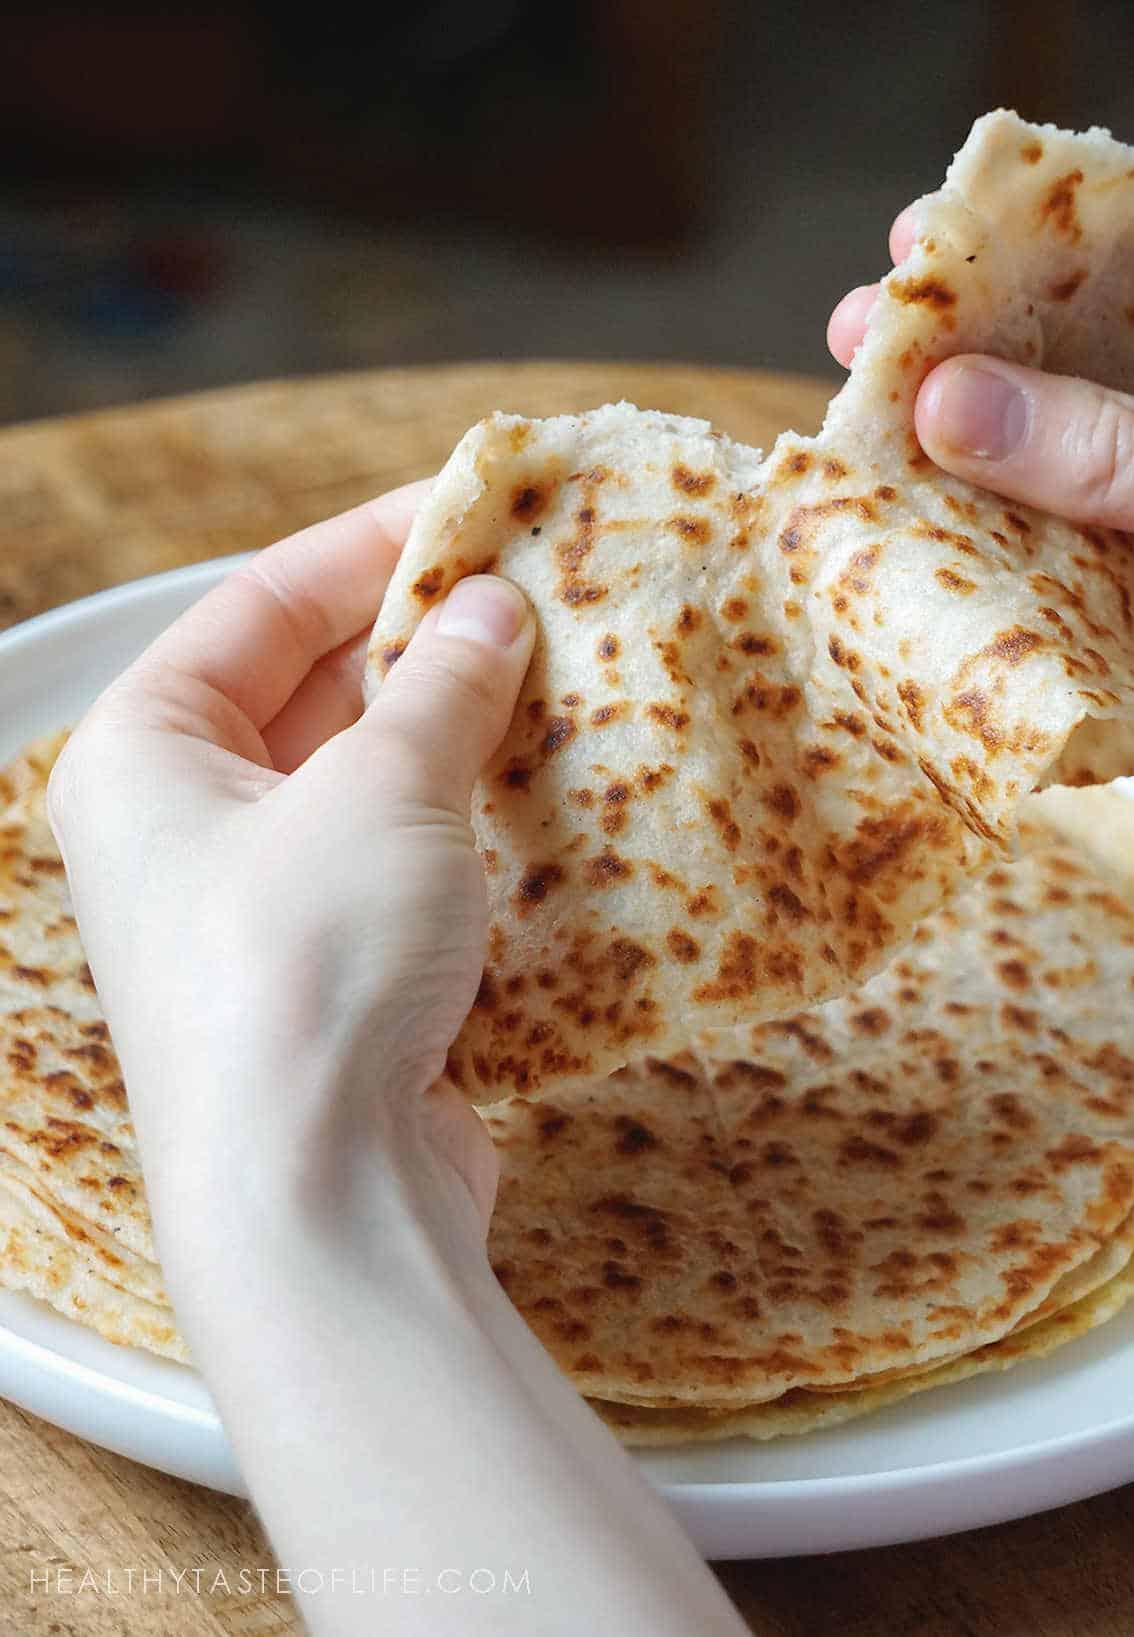 Gluten Free Tortillas Wraps - soft, flexible, thin